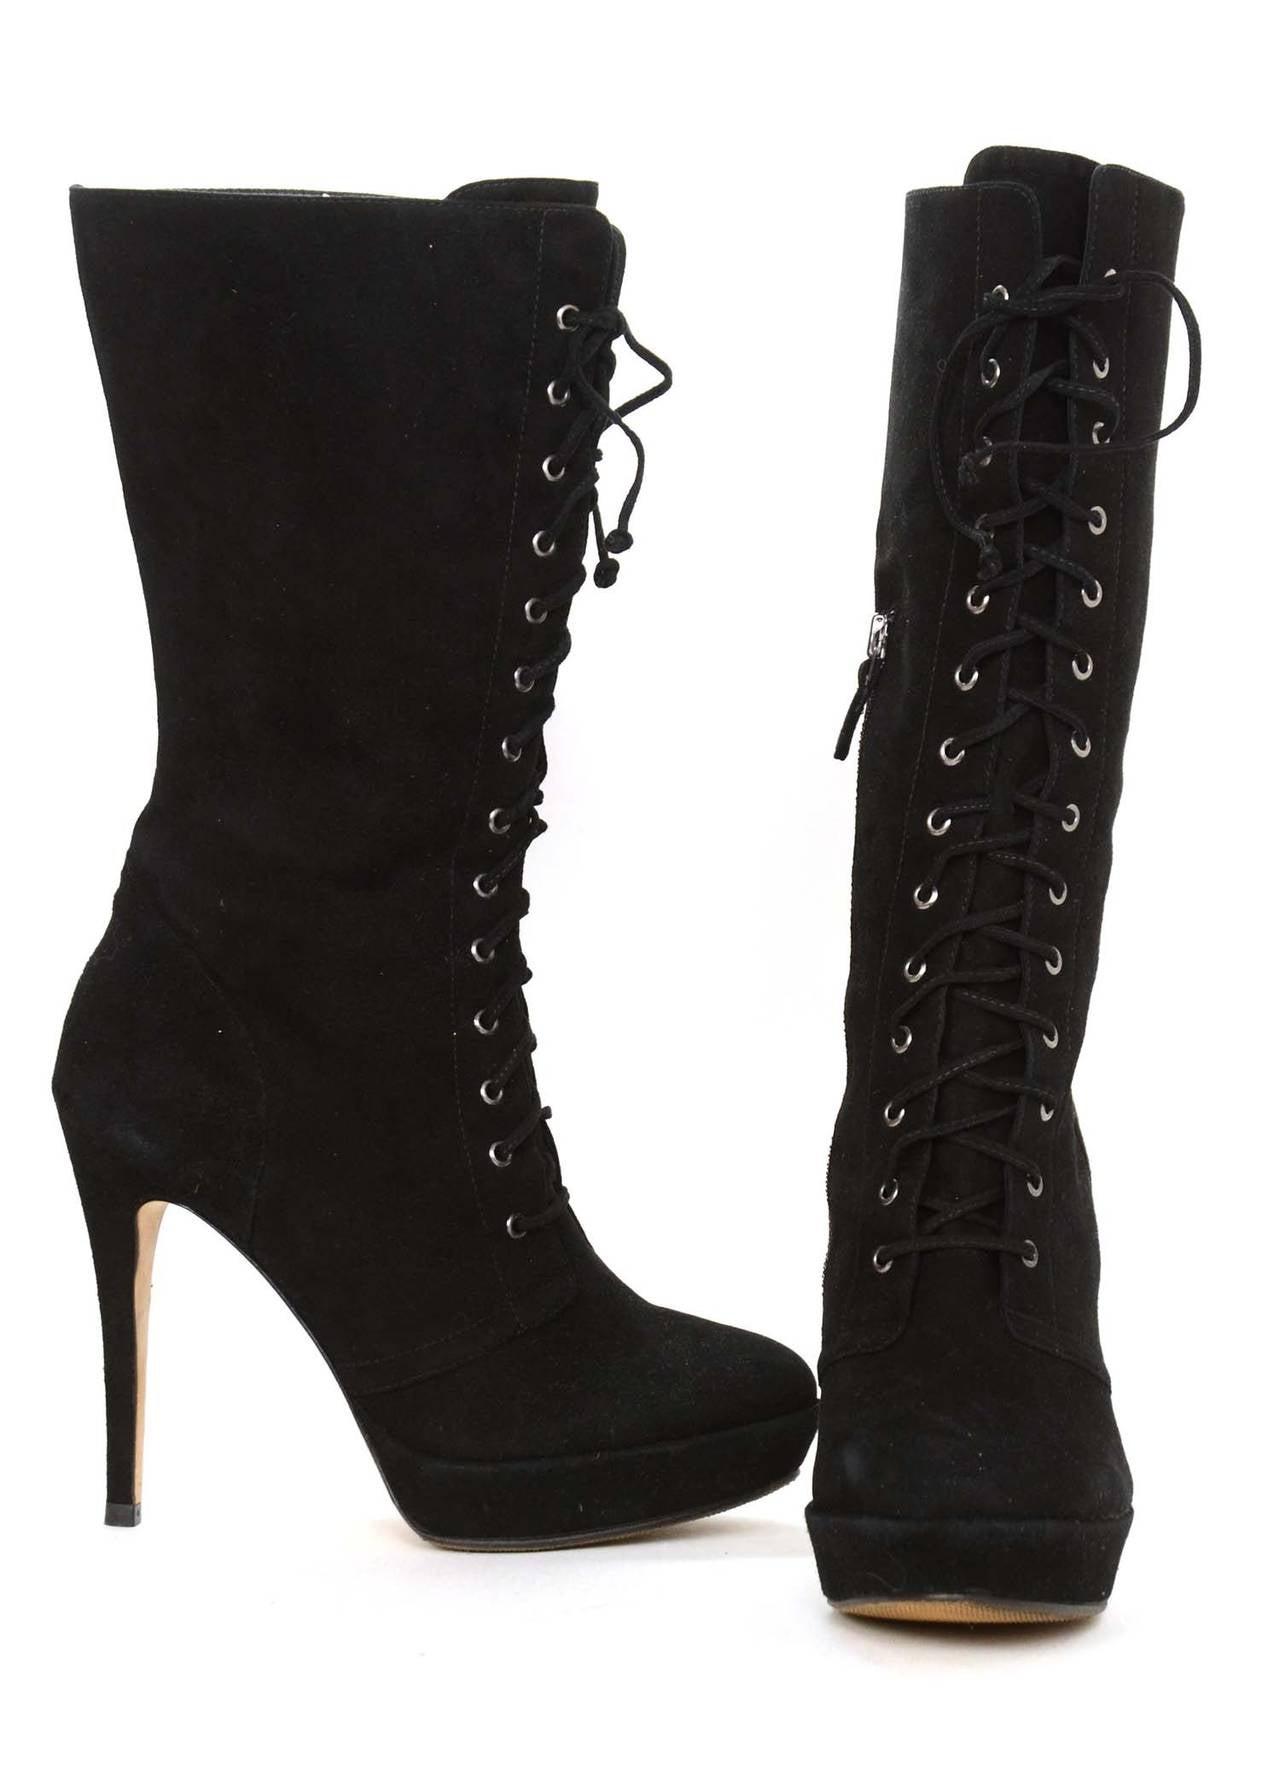 ALEXANDRE BIRMAN Black Suede Lace Up Heeled Boots sz. 10.5 5